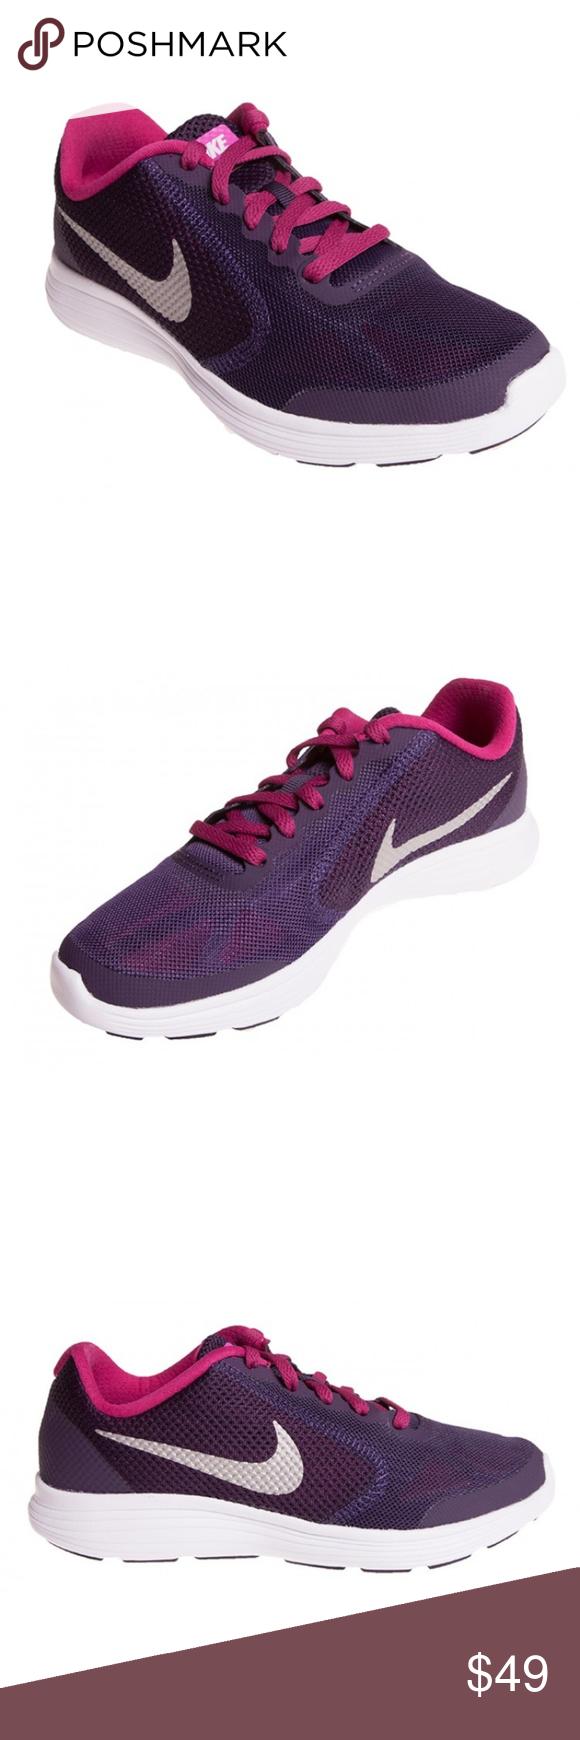 Nike Revolution 3 GS Girls Running Shoe